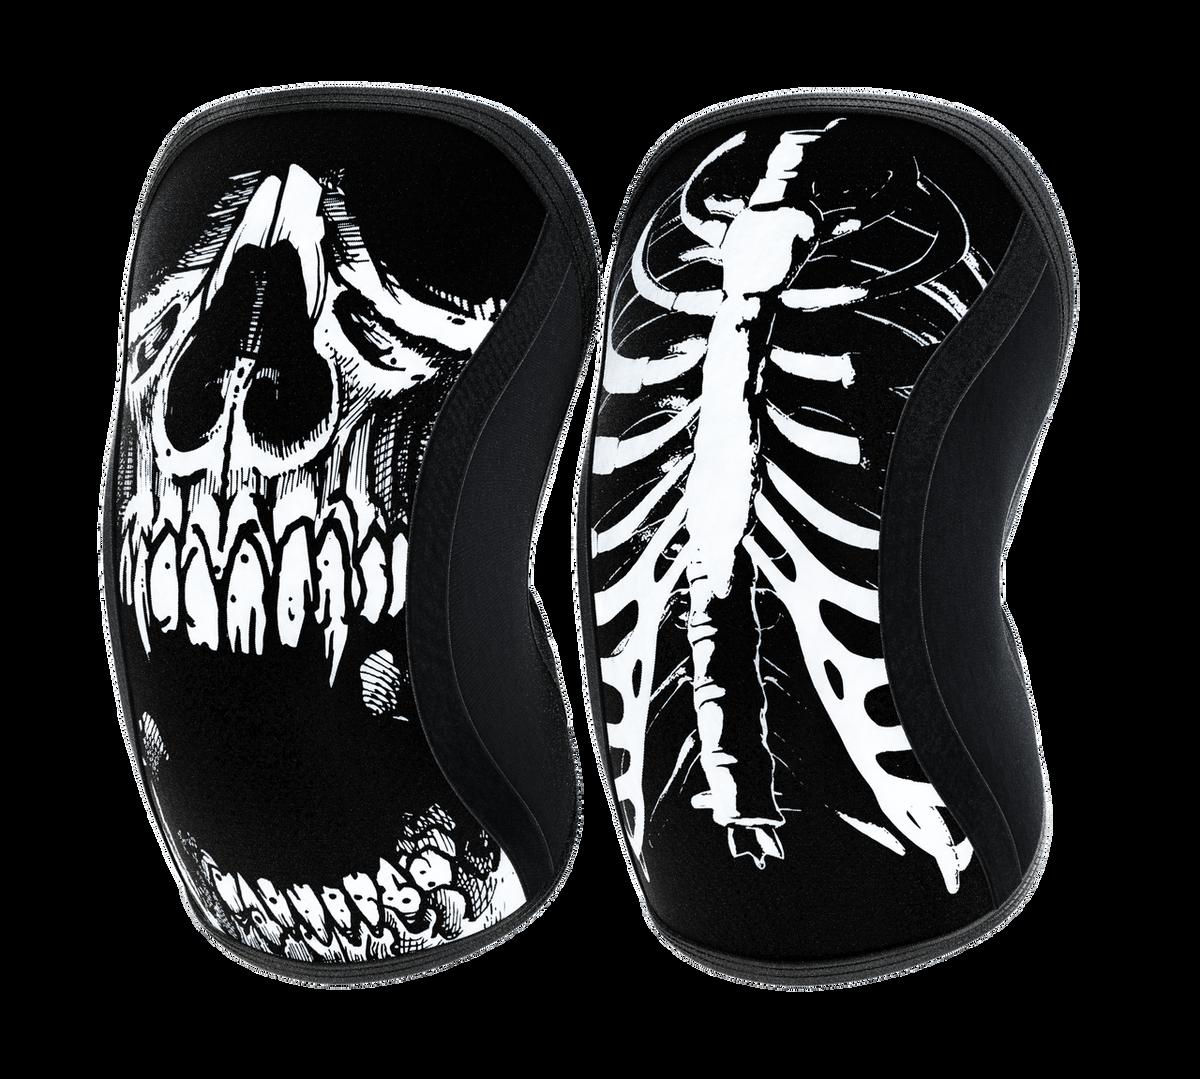 35b9d902e2 Assassins Knee Sleeves - Skull - RockTape